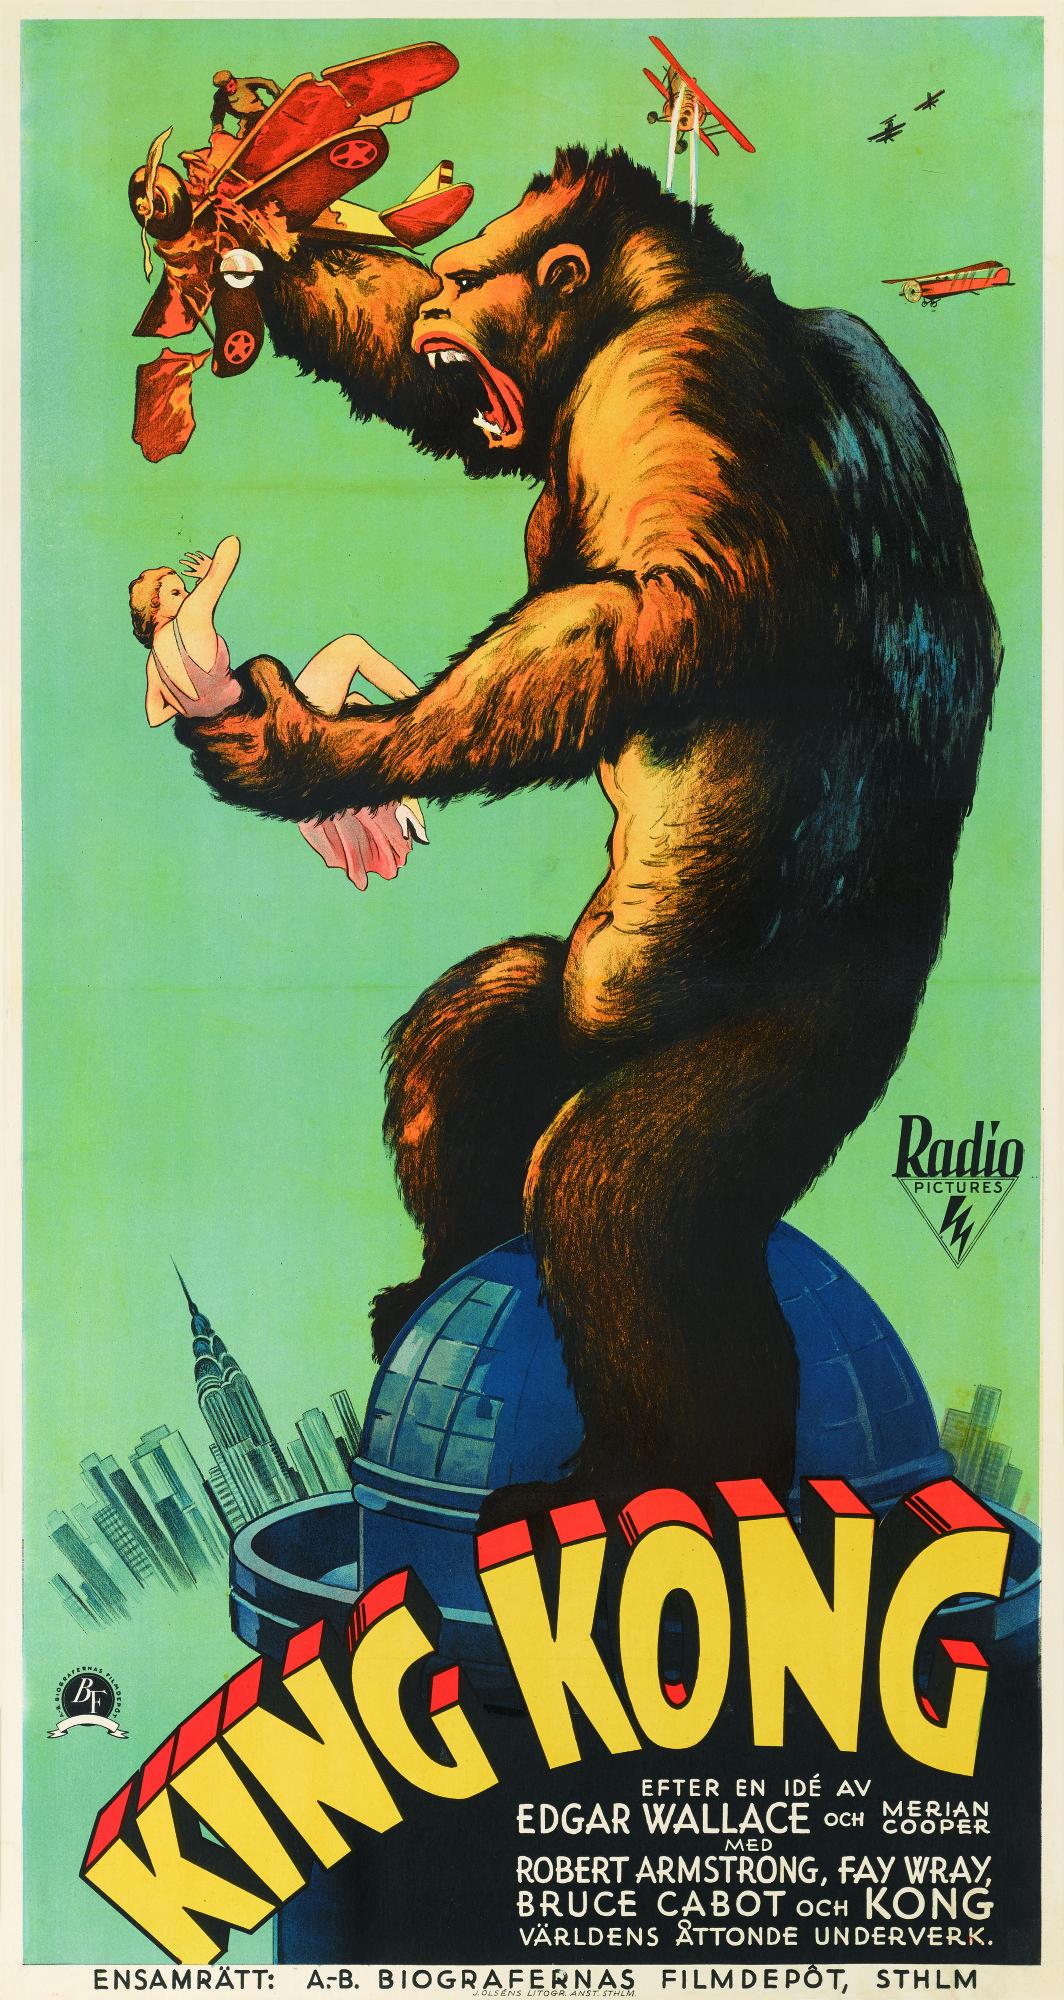 Lot 92 King Kong 1933 Poster Swedish Original Film